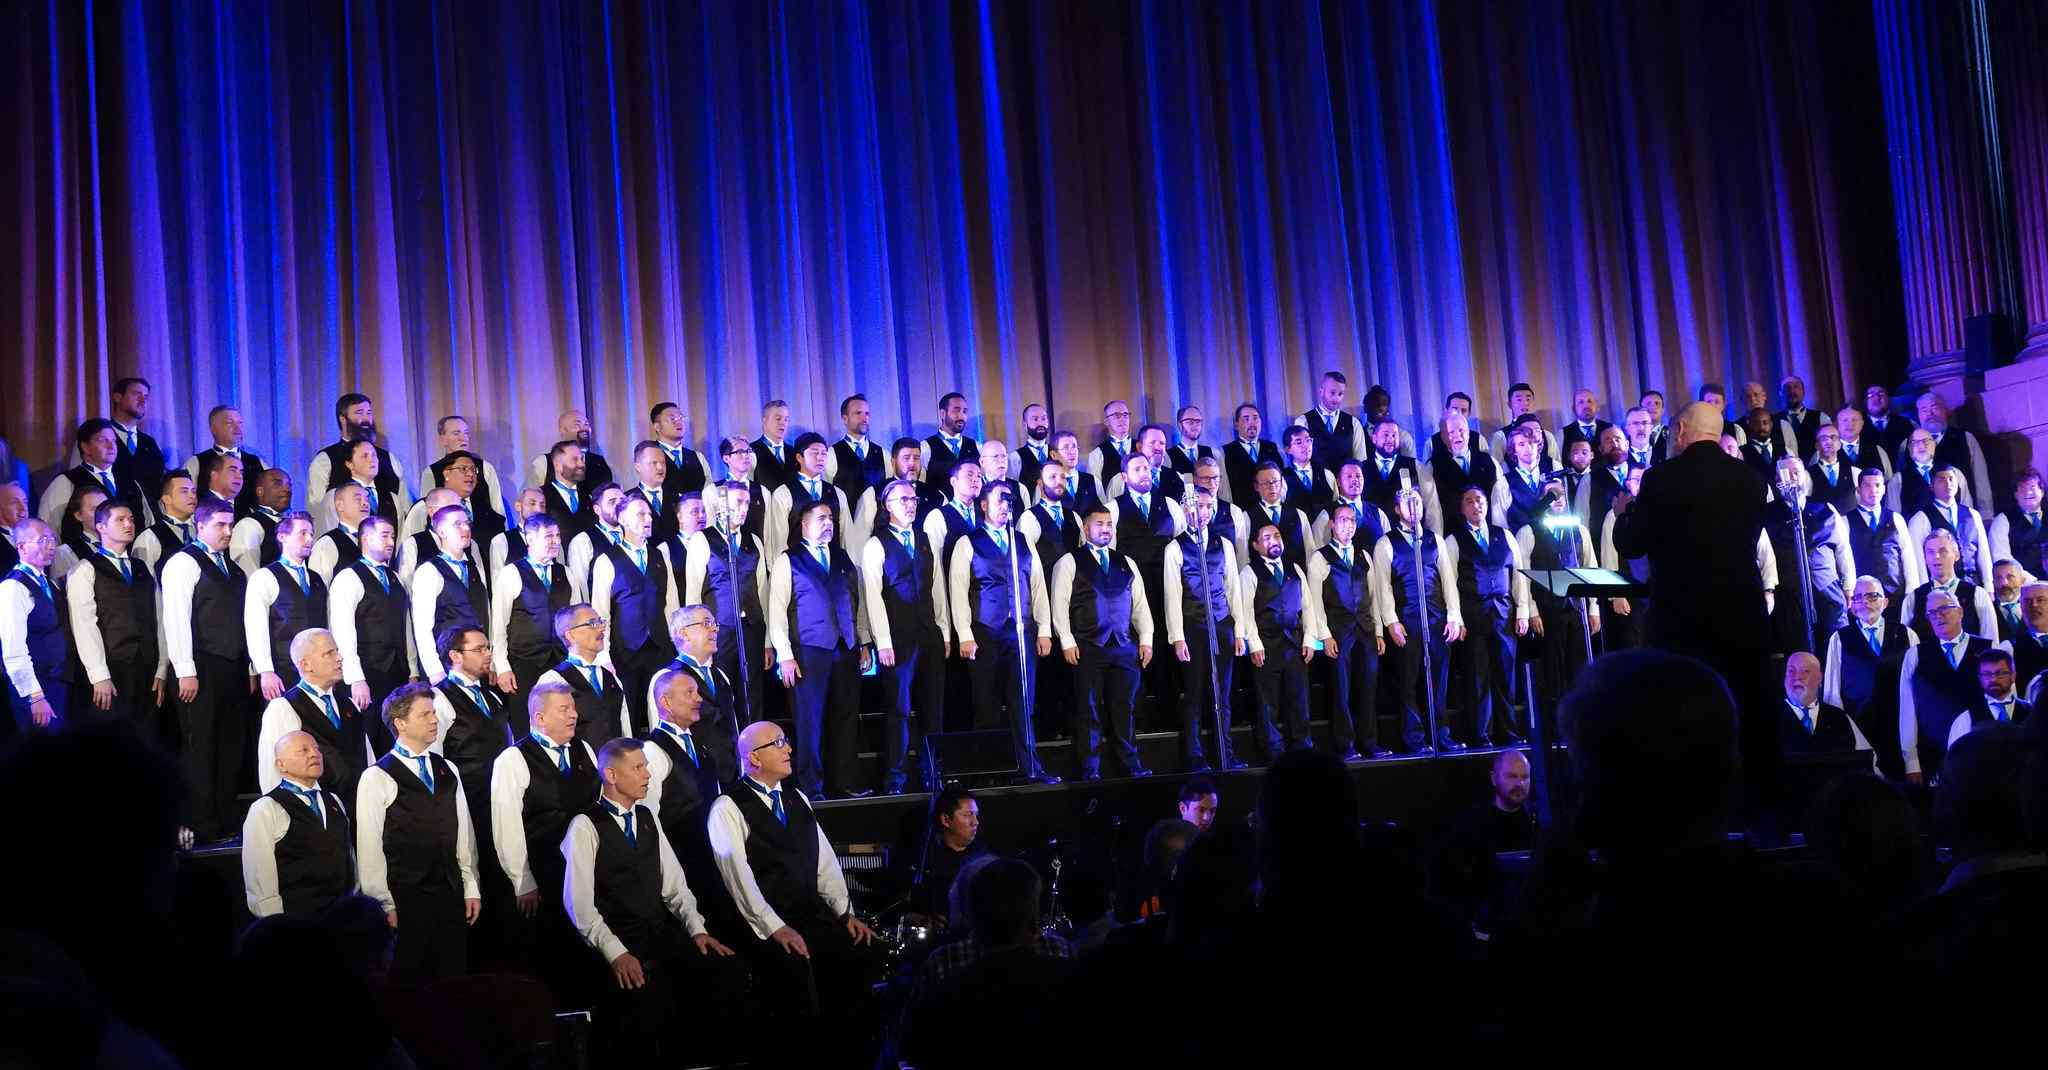 San Francisco Gay Men's Chorus